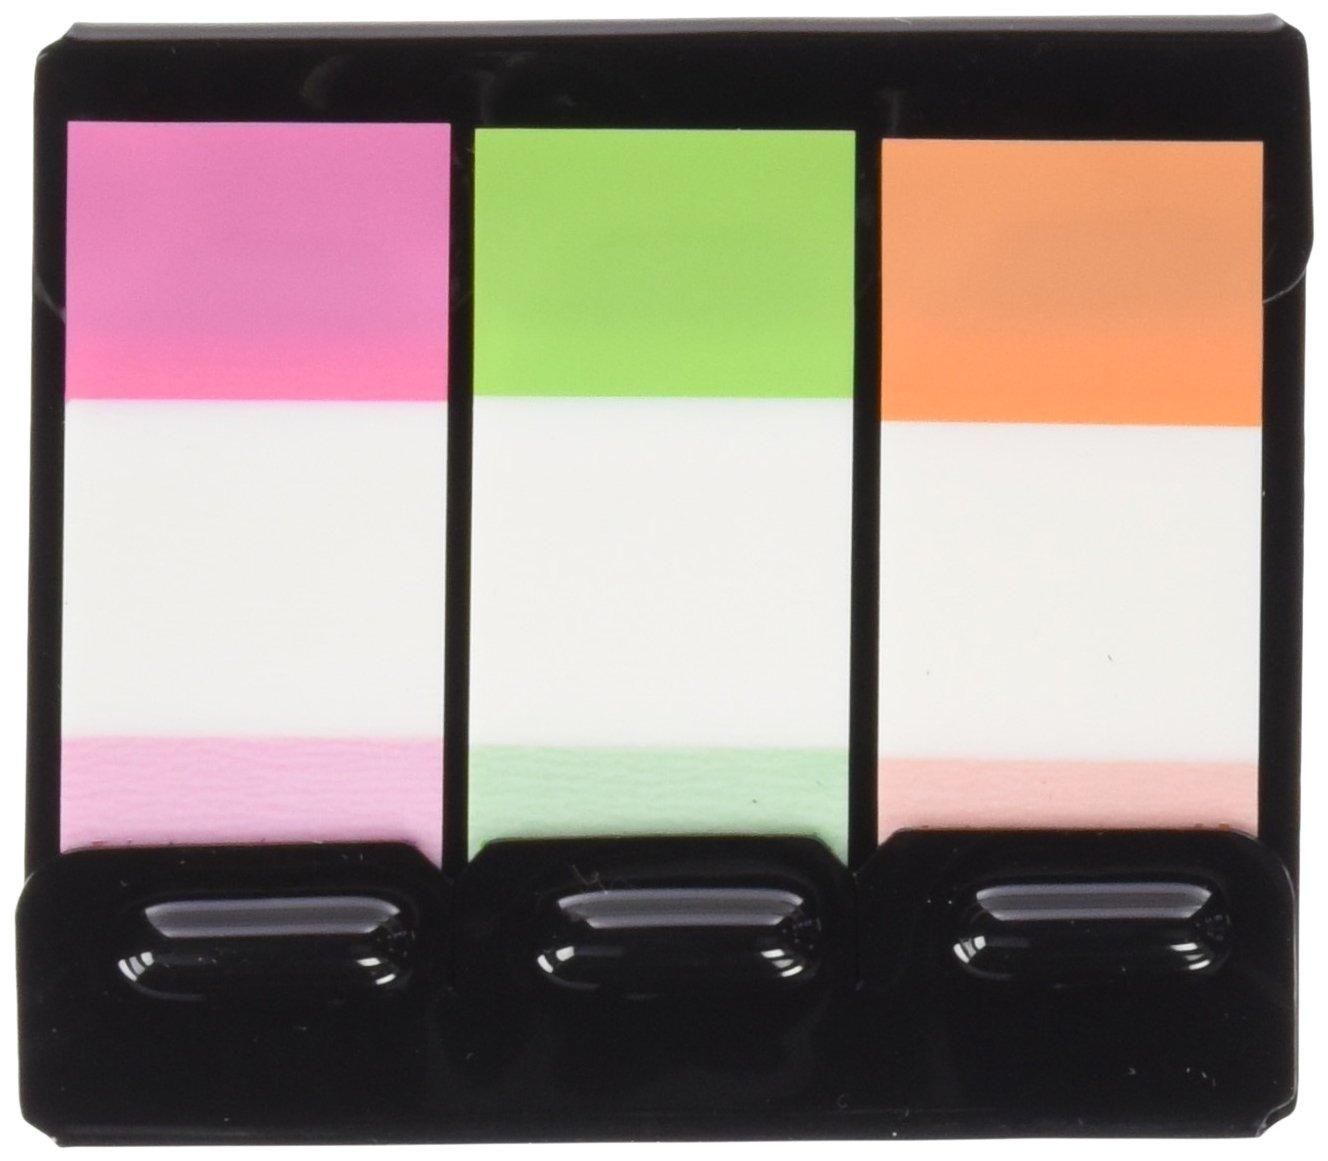 Plus Office Paper In Film Index - Dispensadores 20 banderitas, 3 colores neón Makro Paper SP.SL 45605